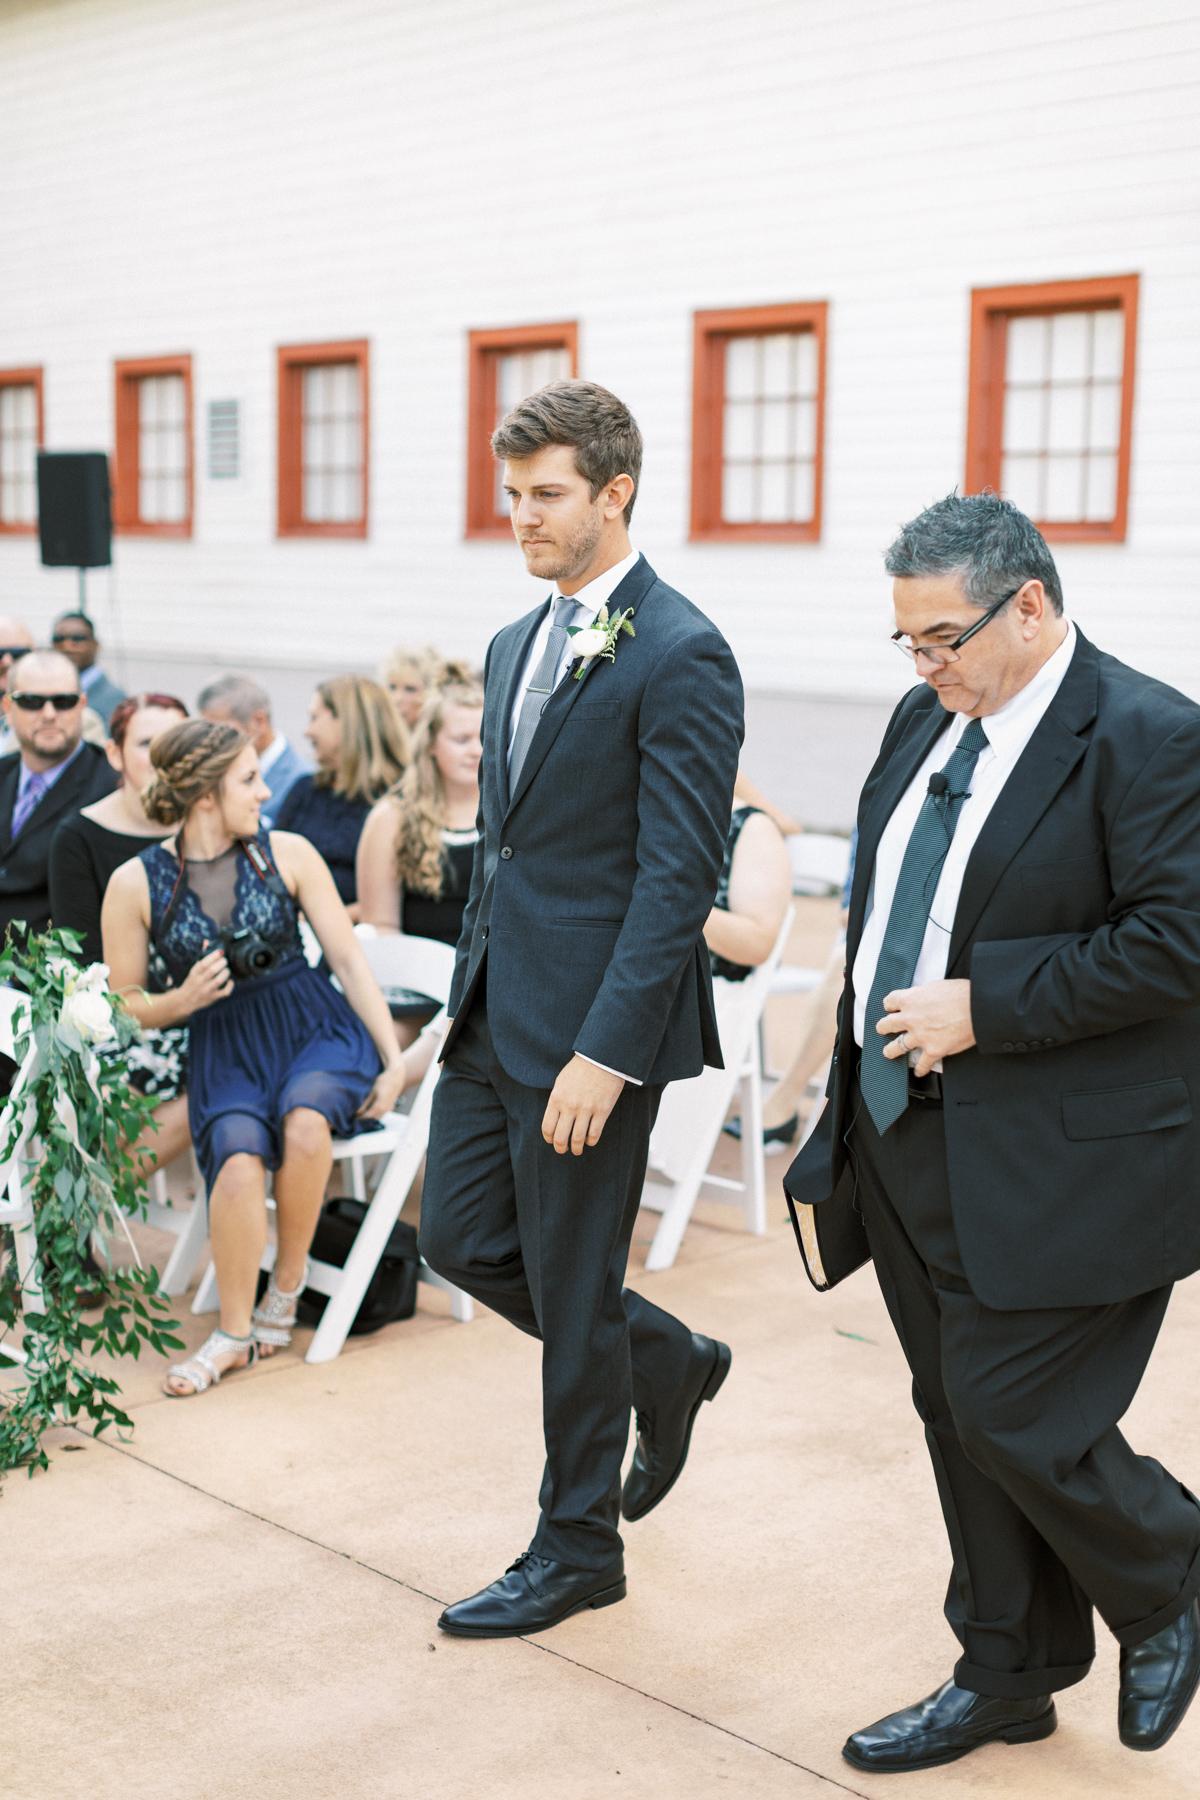 winmock-kinderton-wedding-032.jpg